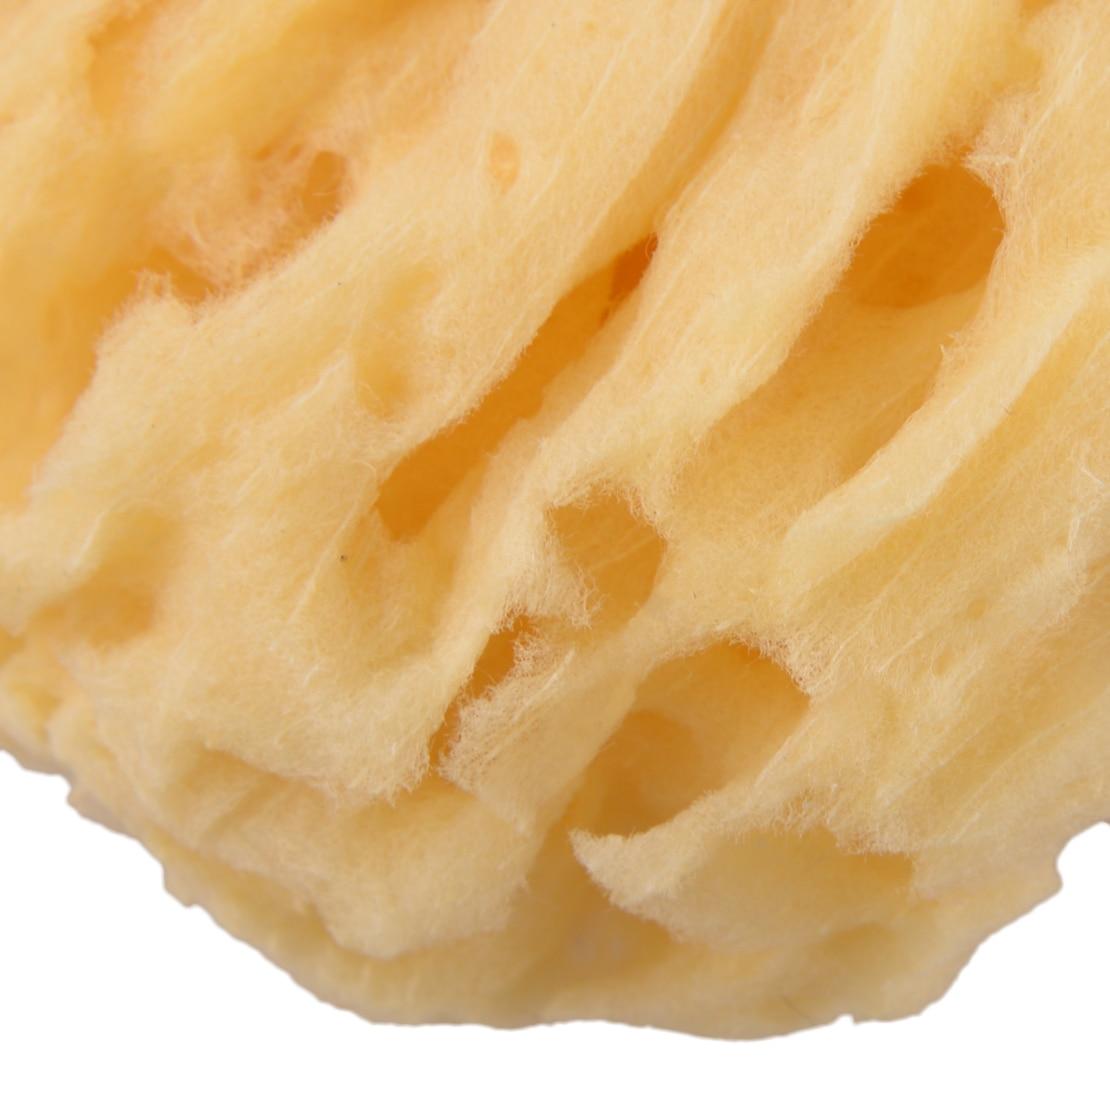 Soft 100% Natural Sea Yellow Sponge Bath Body Shower 10